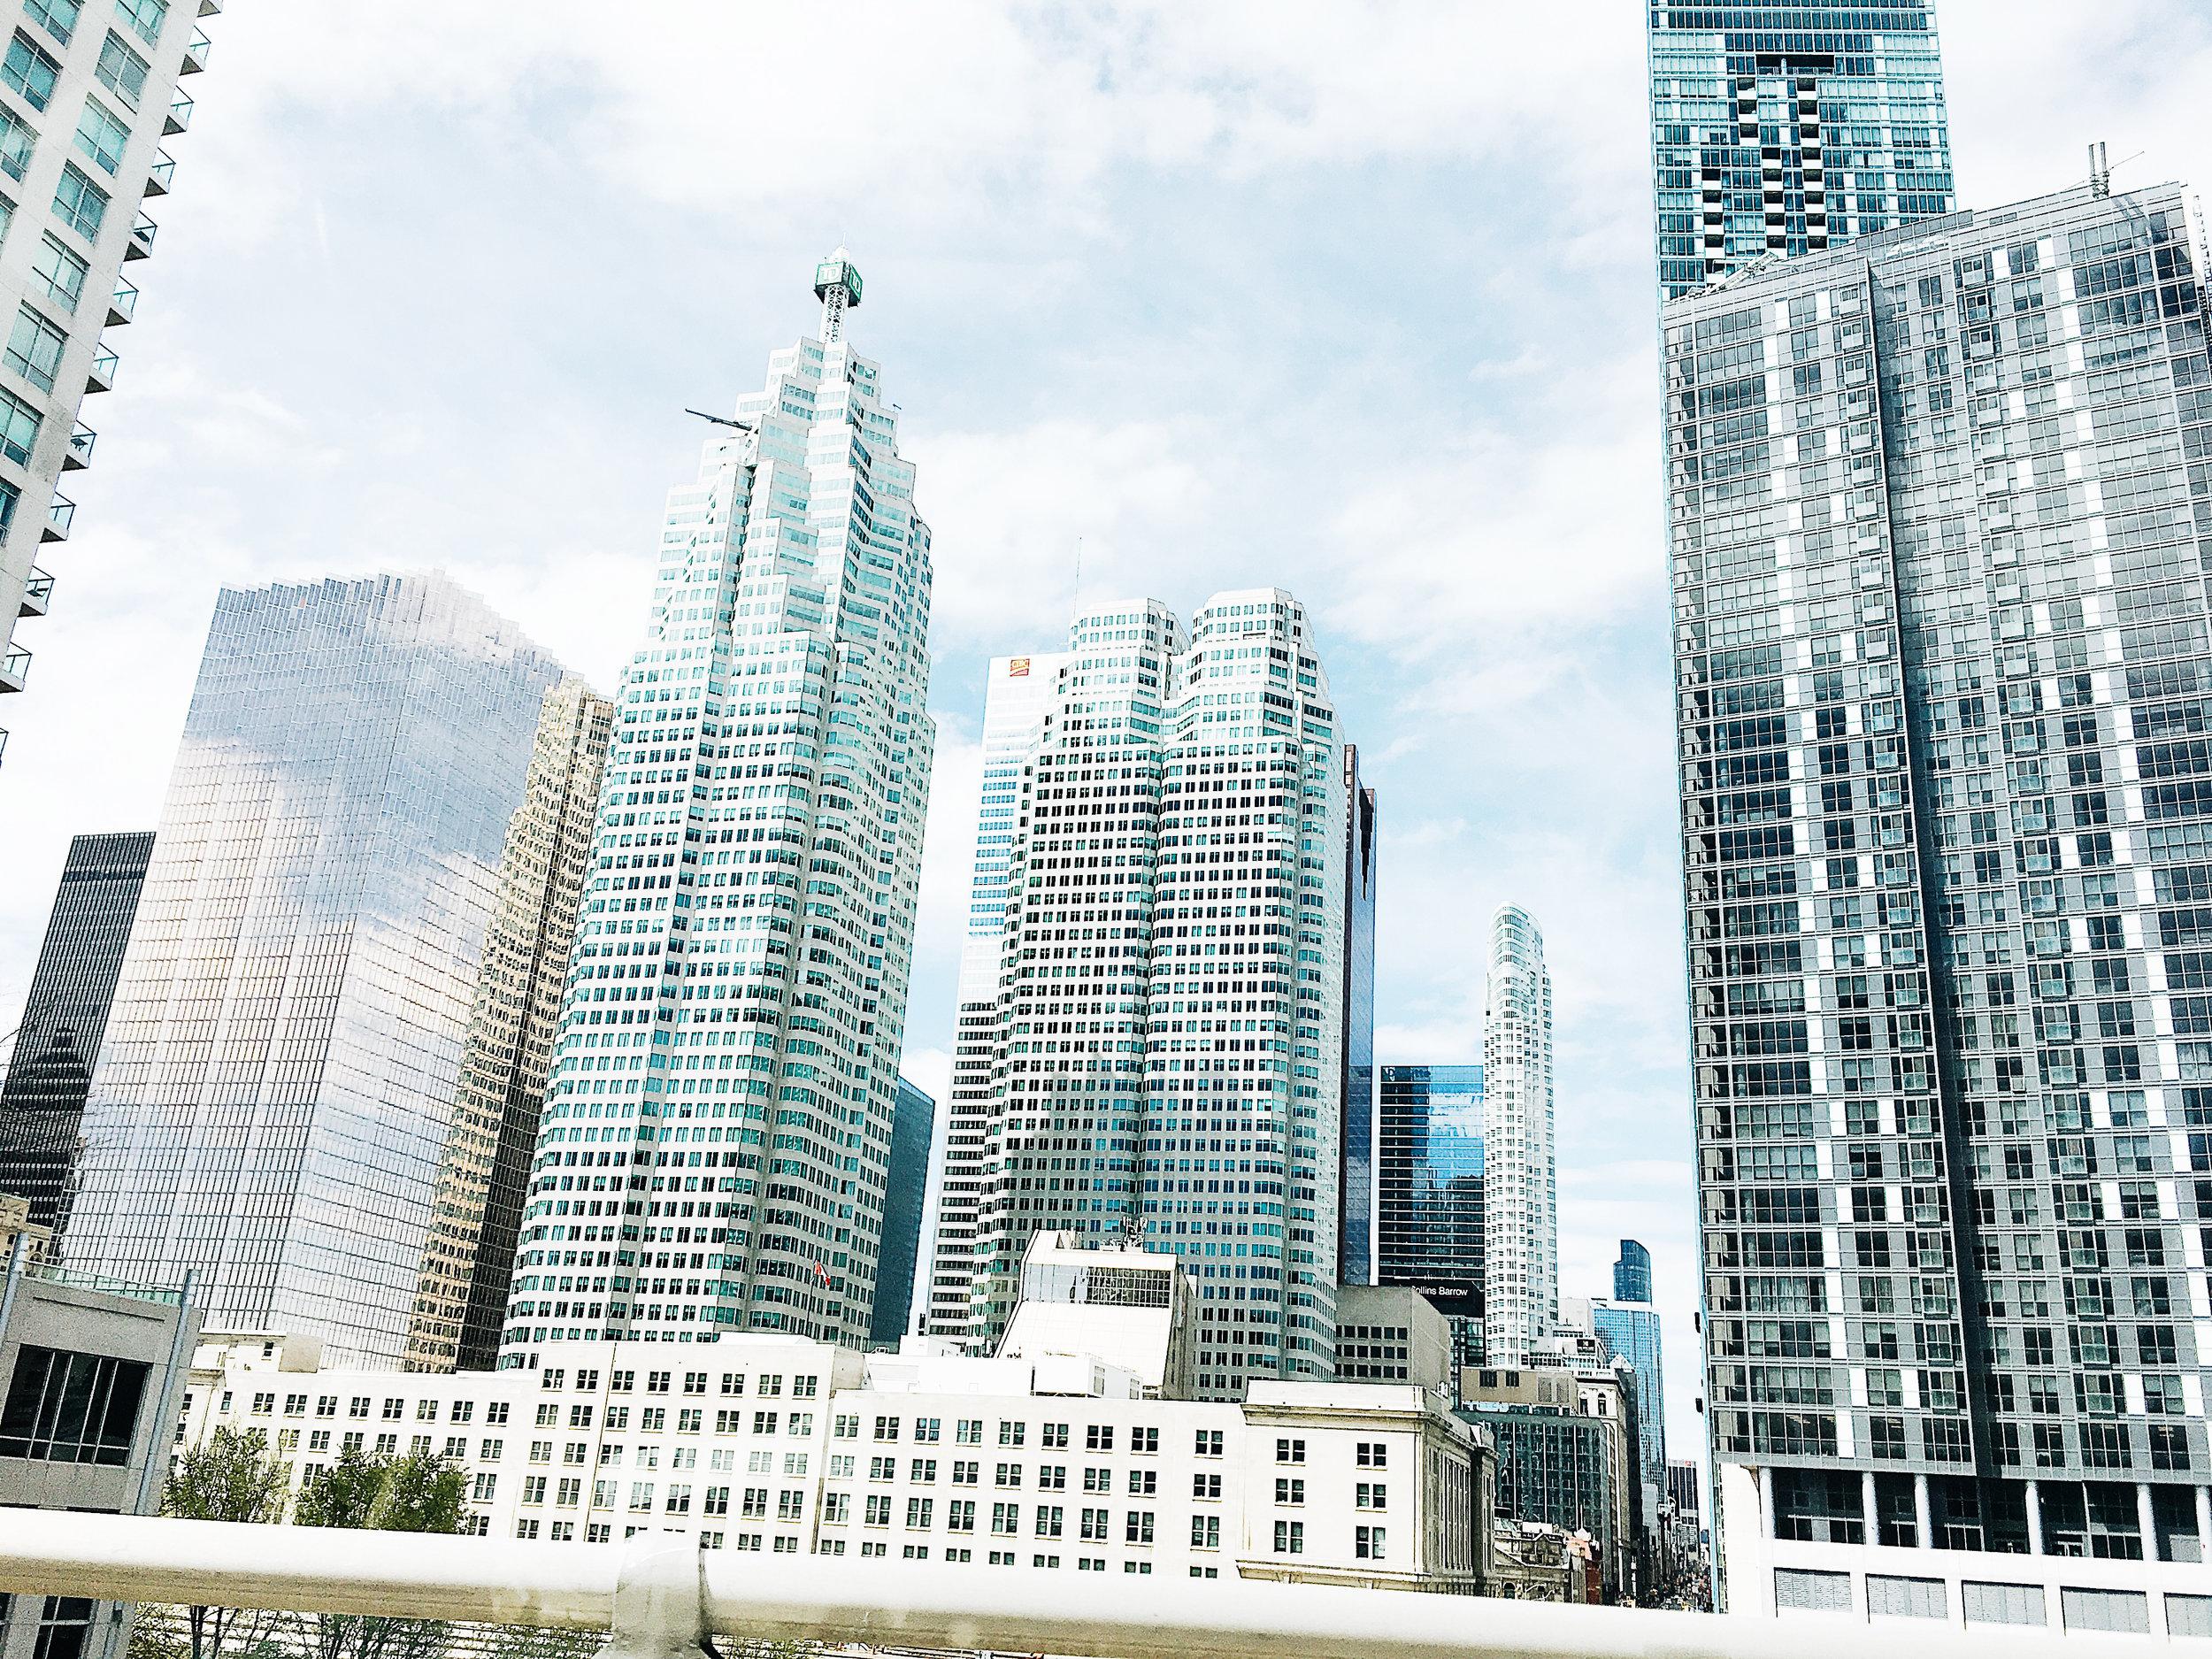 Toronto Phone Pics-23.jpg